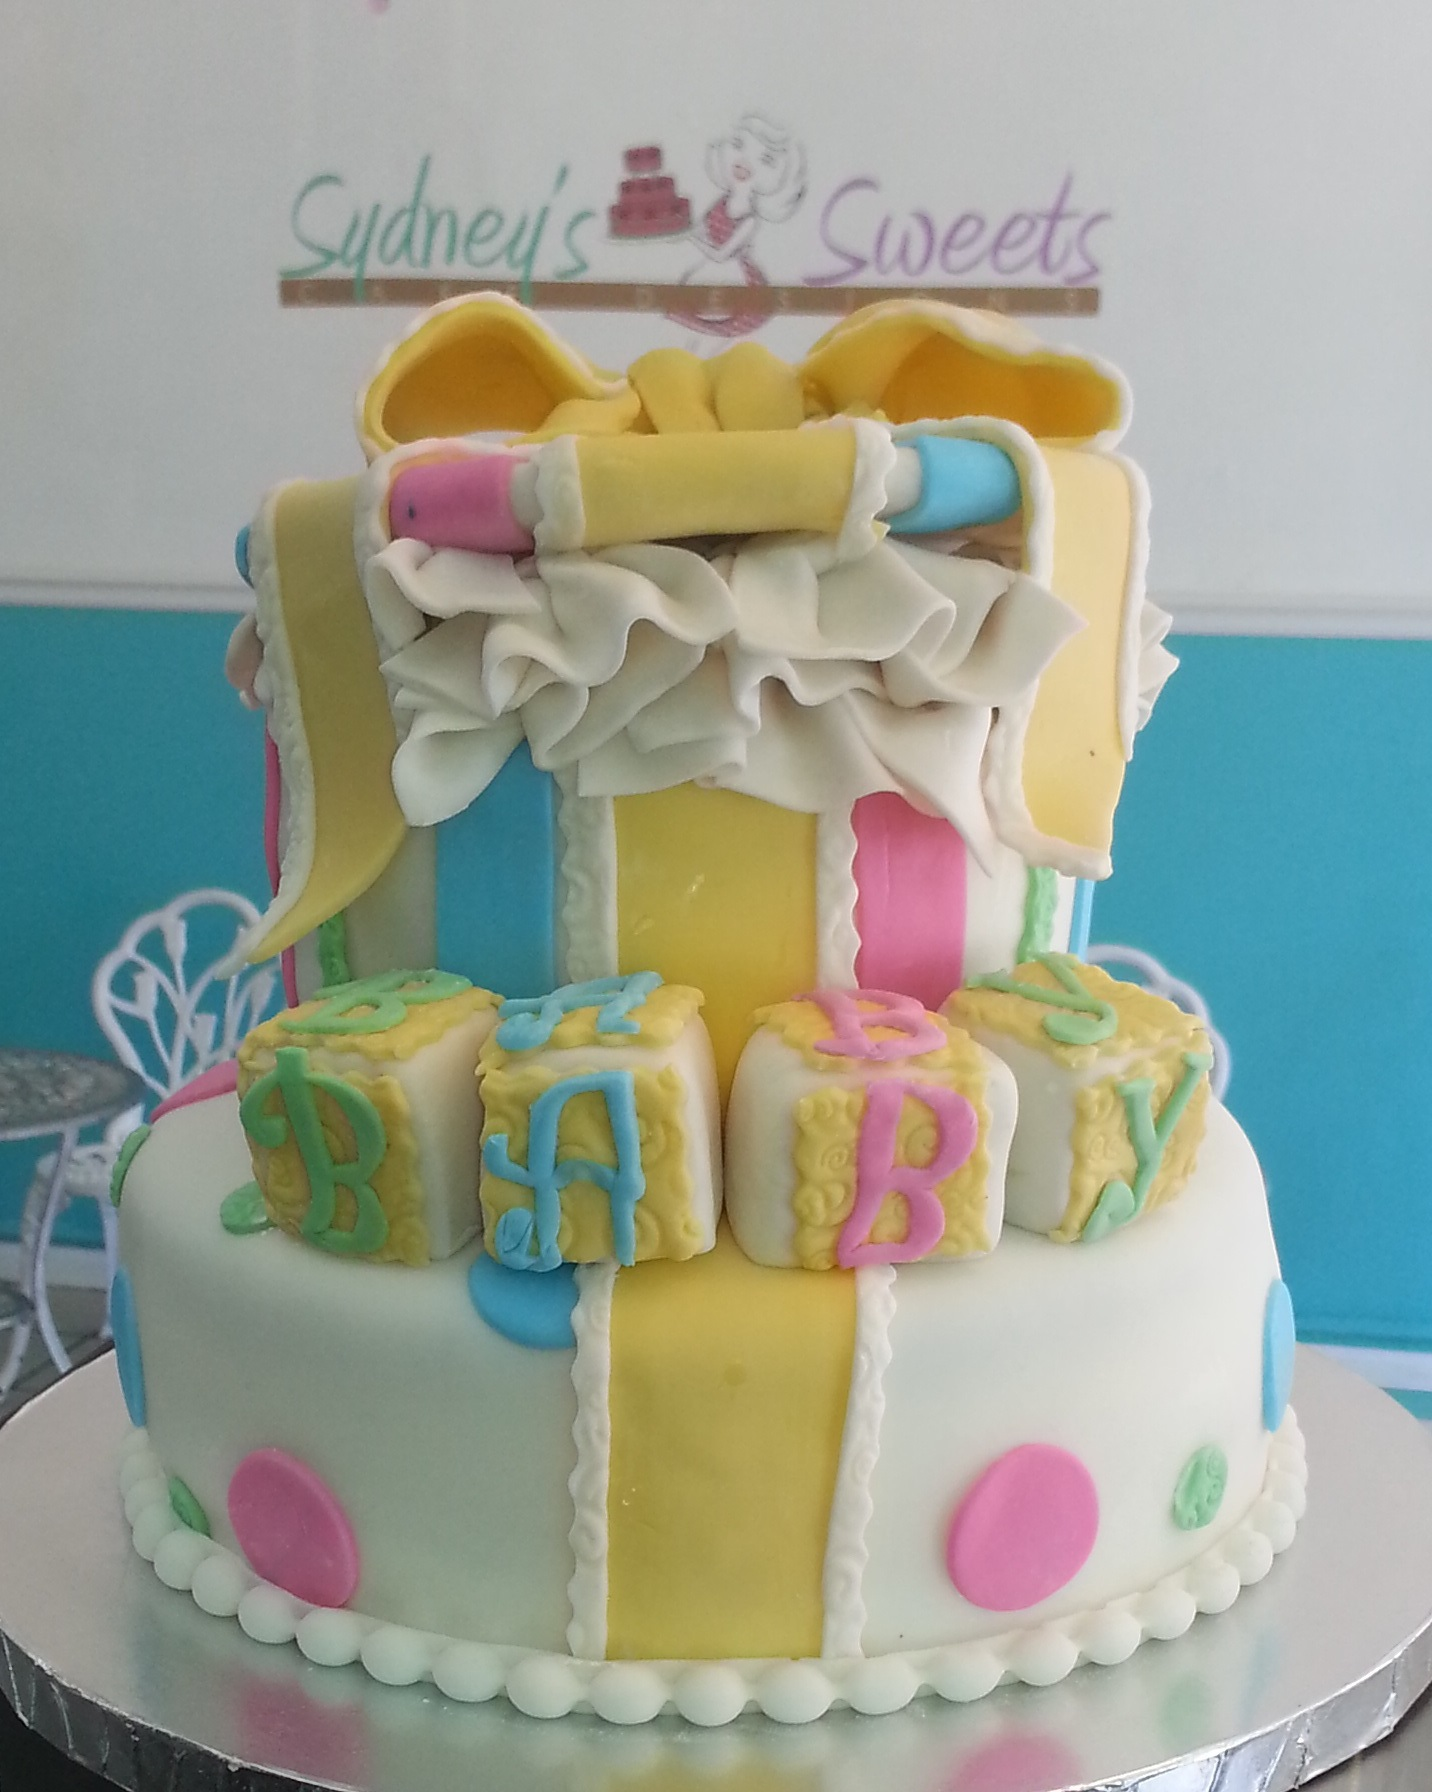 Pretentious Gender Neutral Gift Box Baby Shower Cake Sydneys S1 Gender Neutral Baby Shower Mes Gender Neutral Baby Shower Punch baby shower Gender Neutral Baby Shower